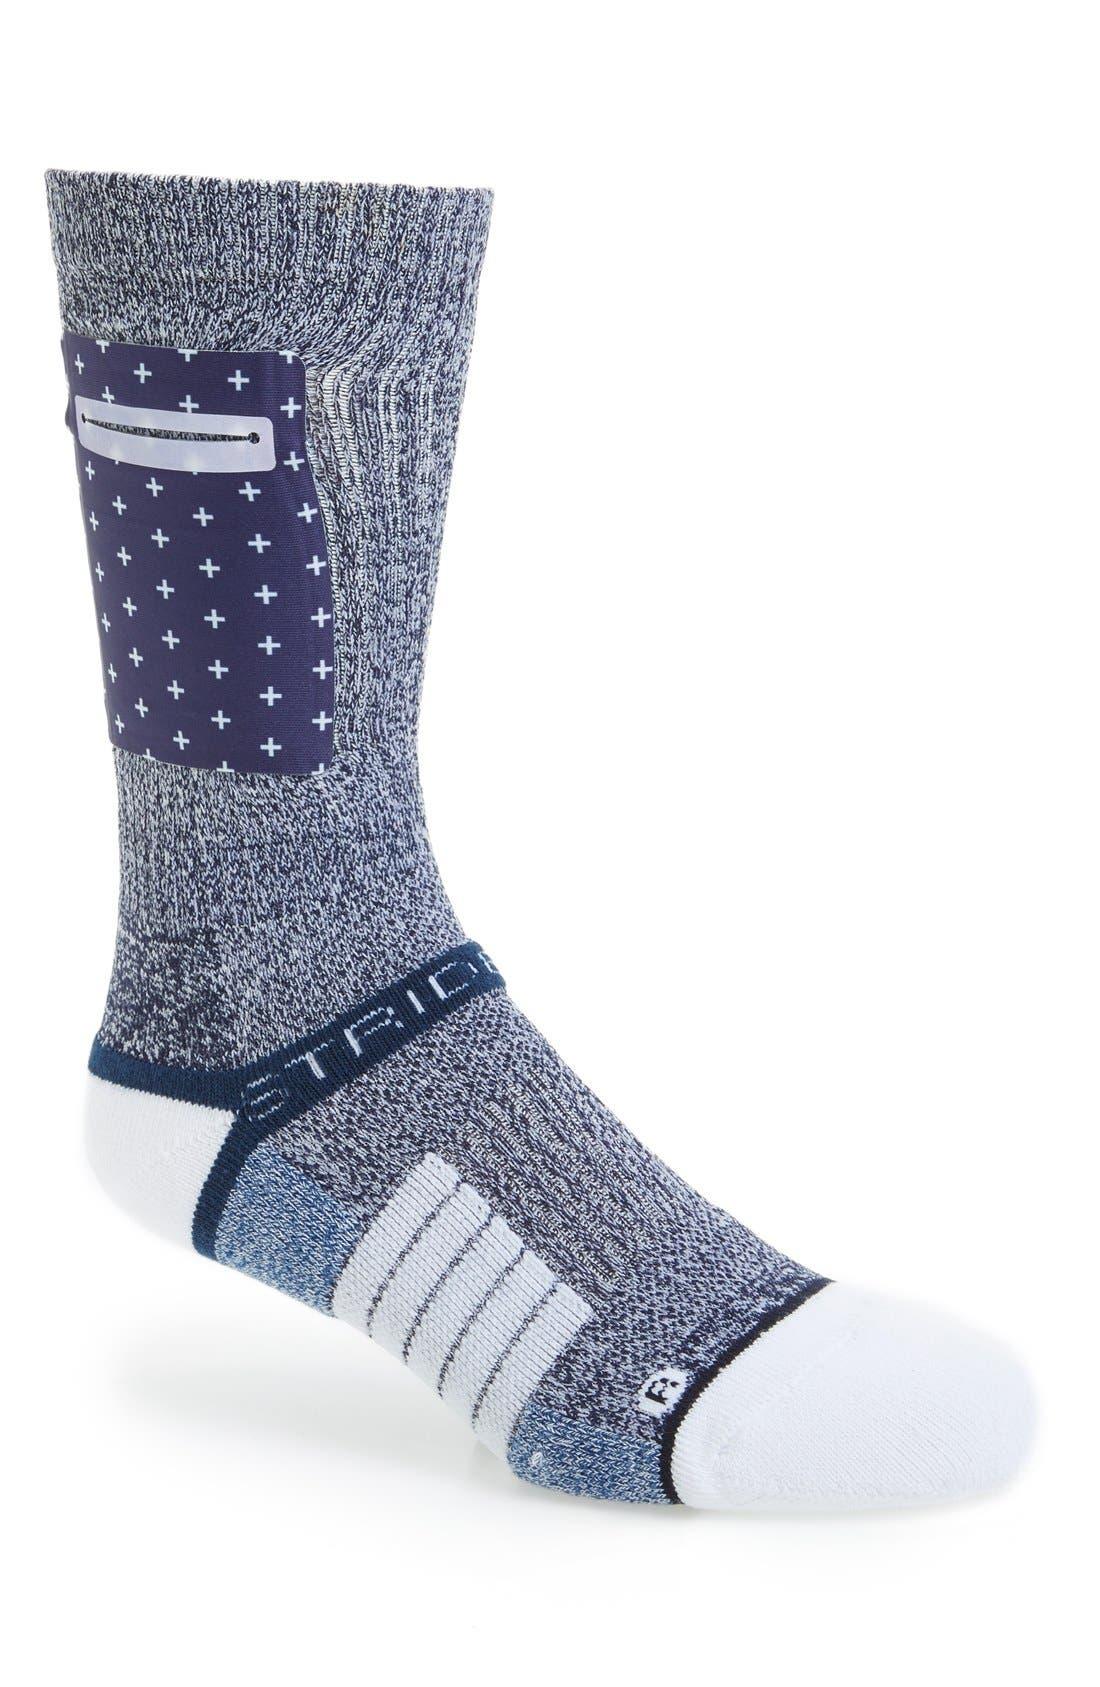 x Nate Robinson 'Pocket Sock - Portside' Strapped Fit 2.0 Socks,                             Main thumbnail 1, color,                             020